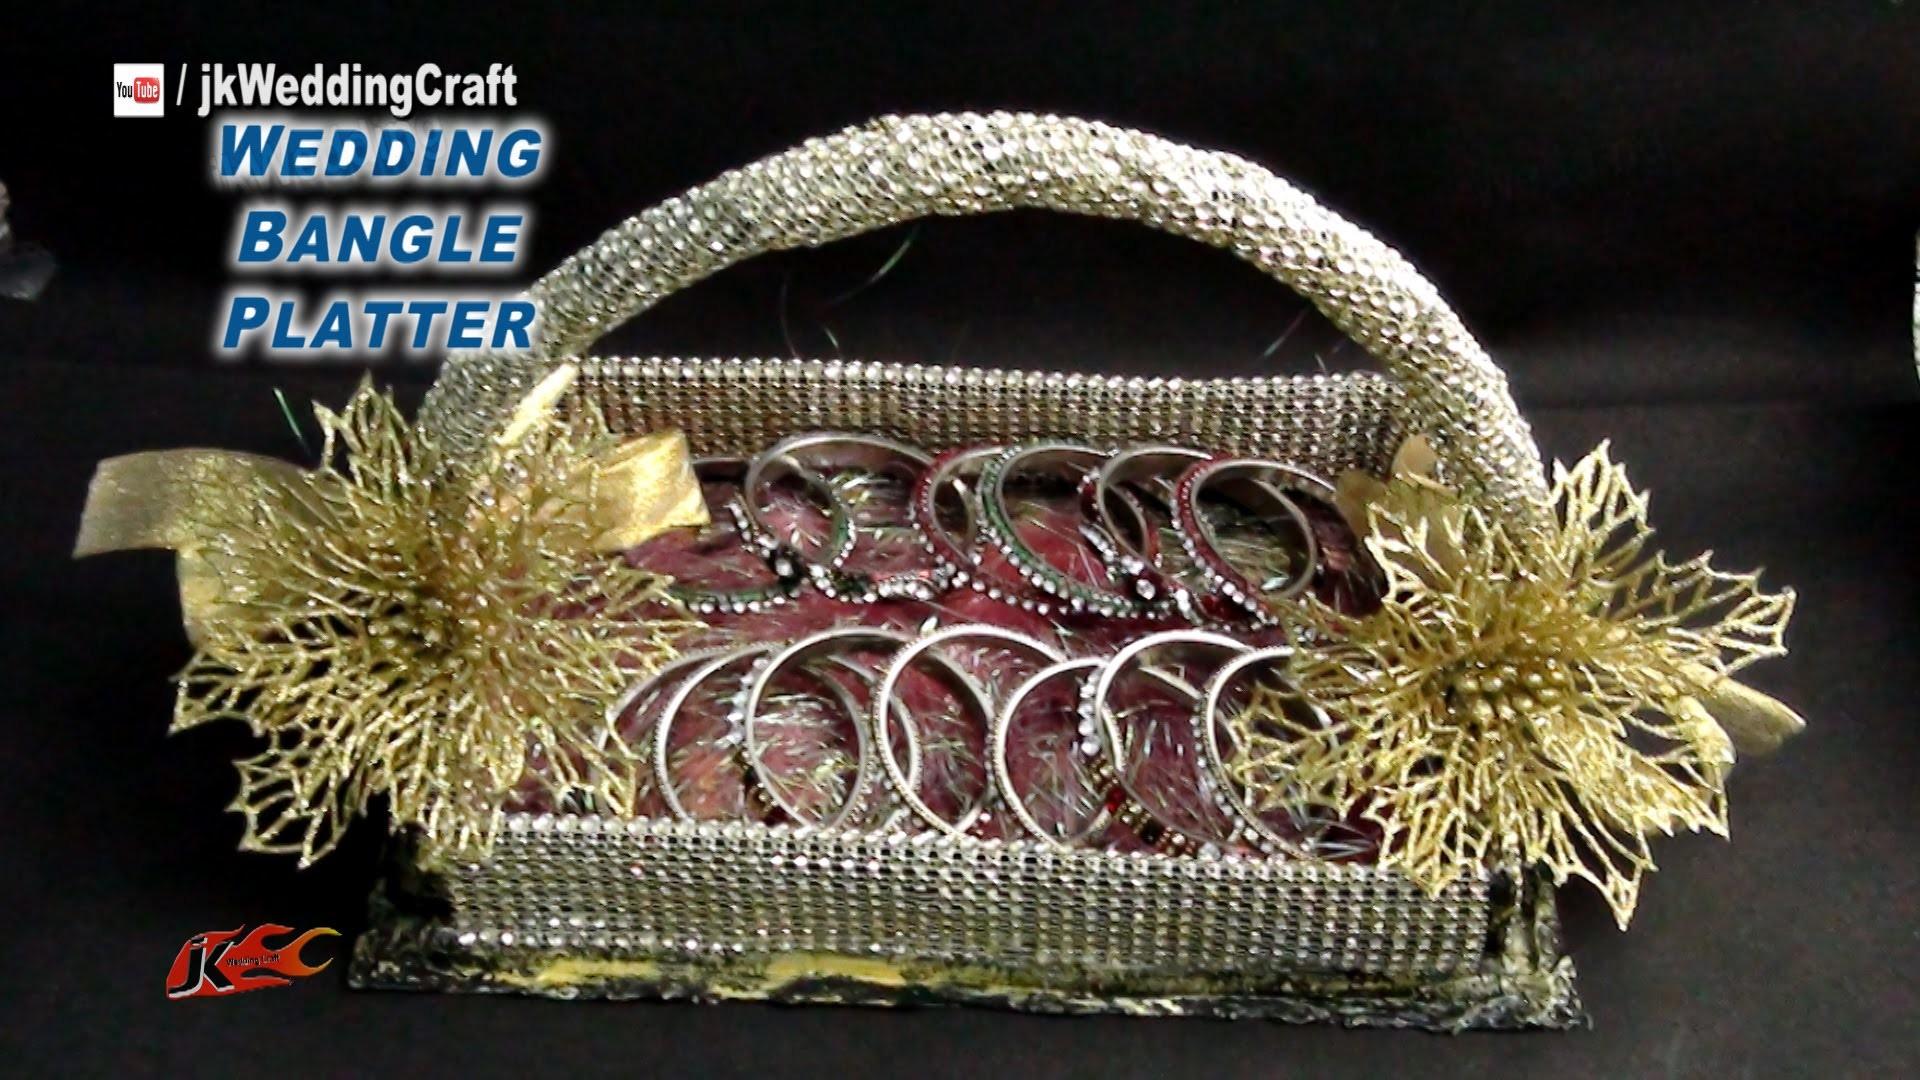 DIY  Wedding Gift Basket for jewelry, bangles  | How to make | JK Wedding Craft 073